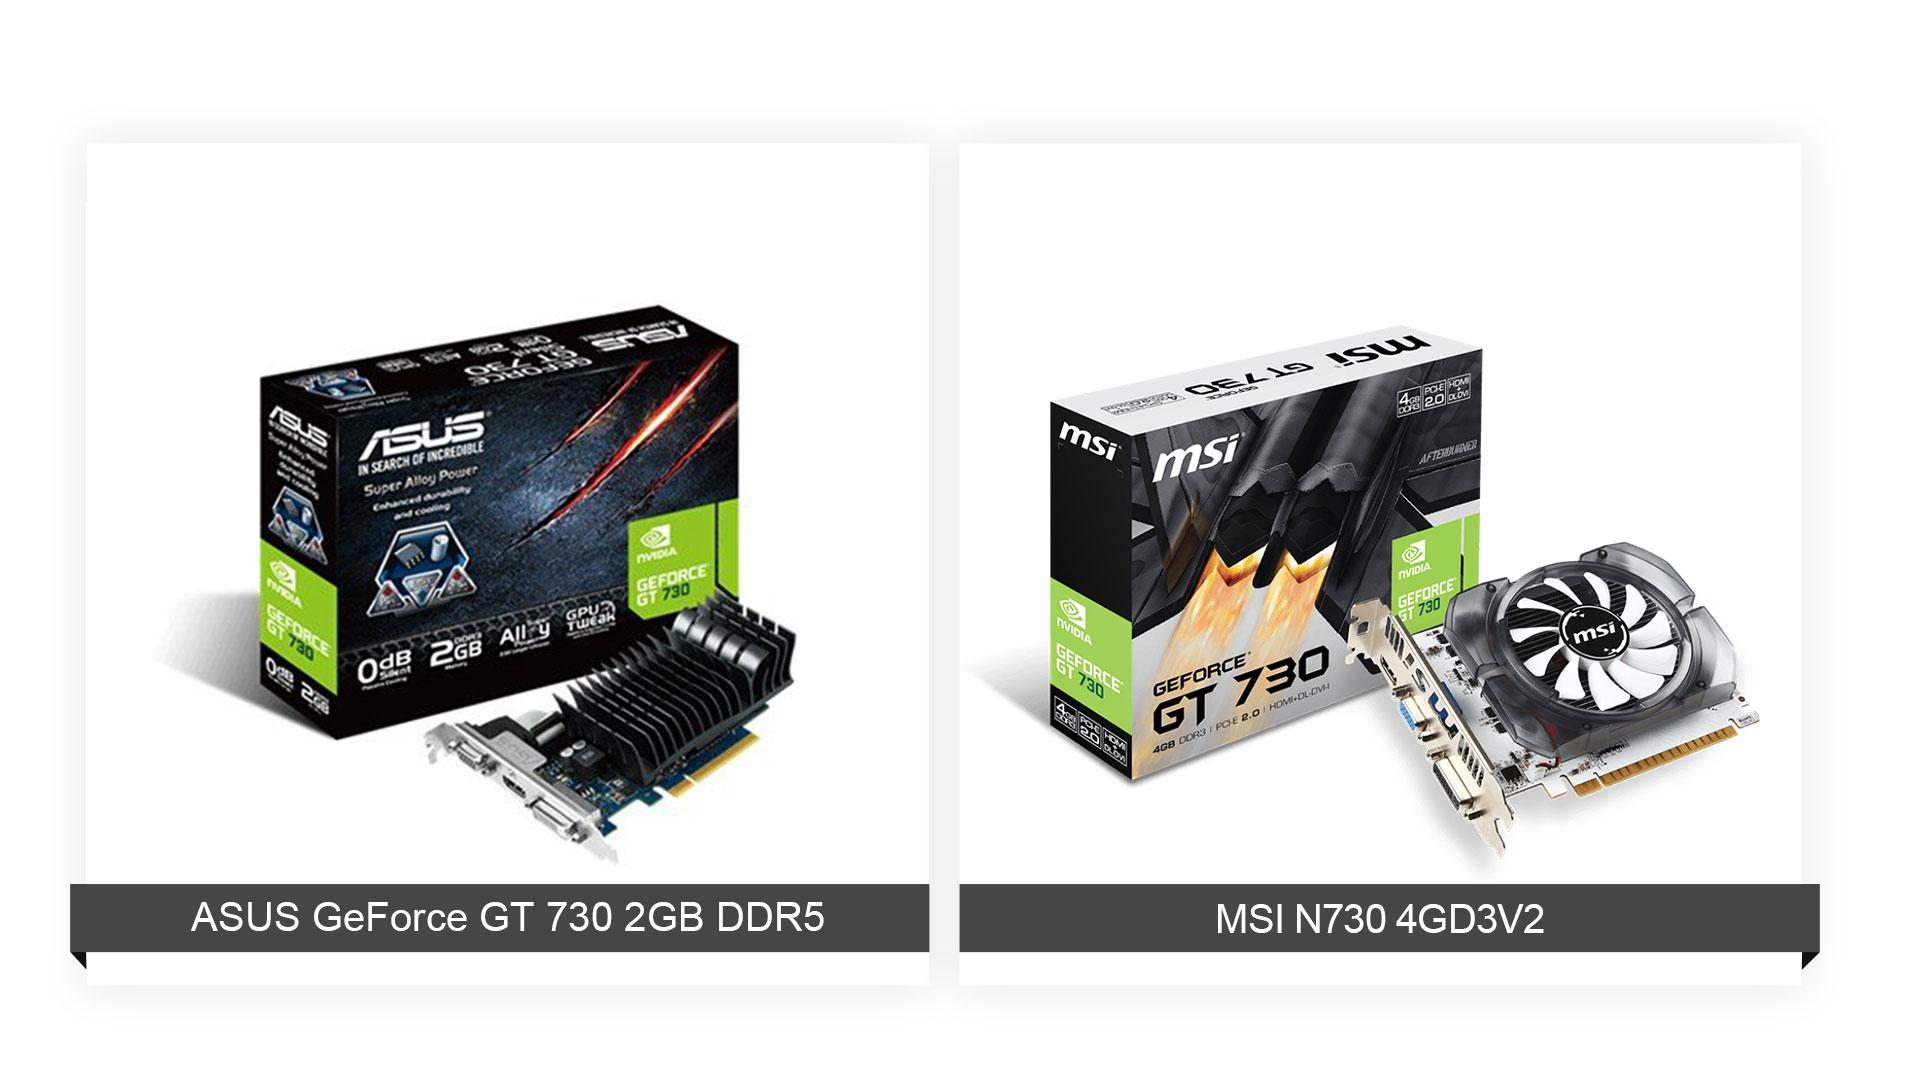 ASUS GeForce GT 730 2GB DDR5 Vs MSI N730 4GD3V2